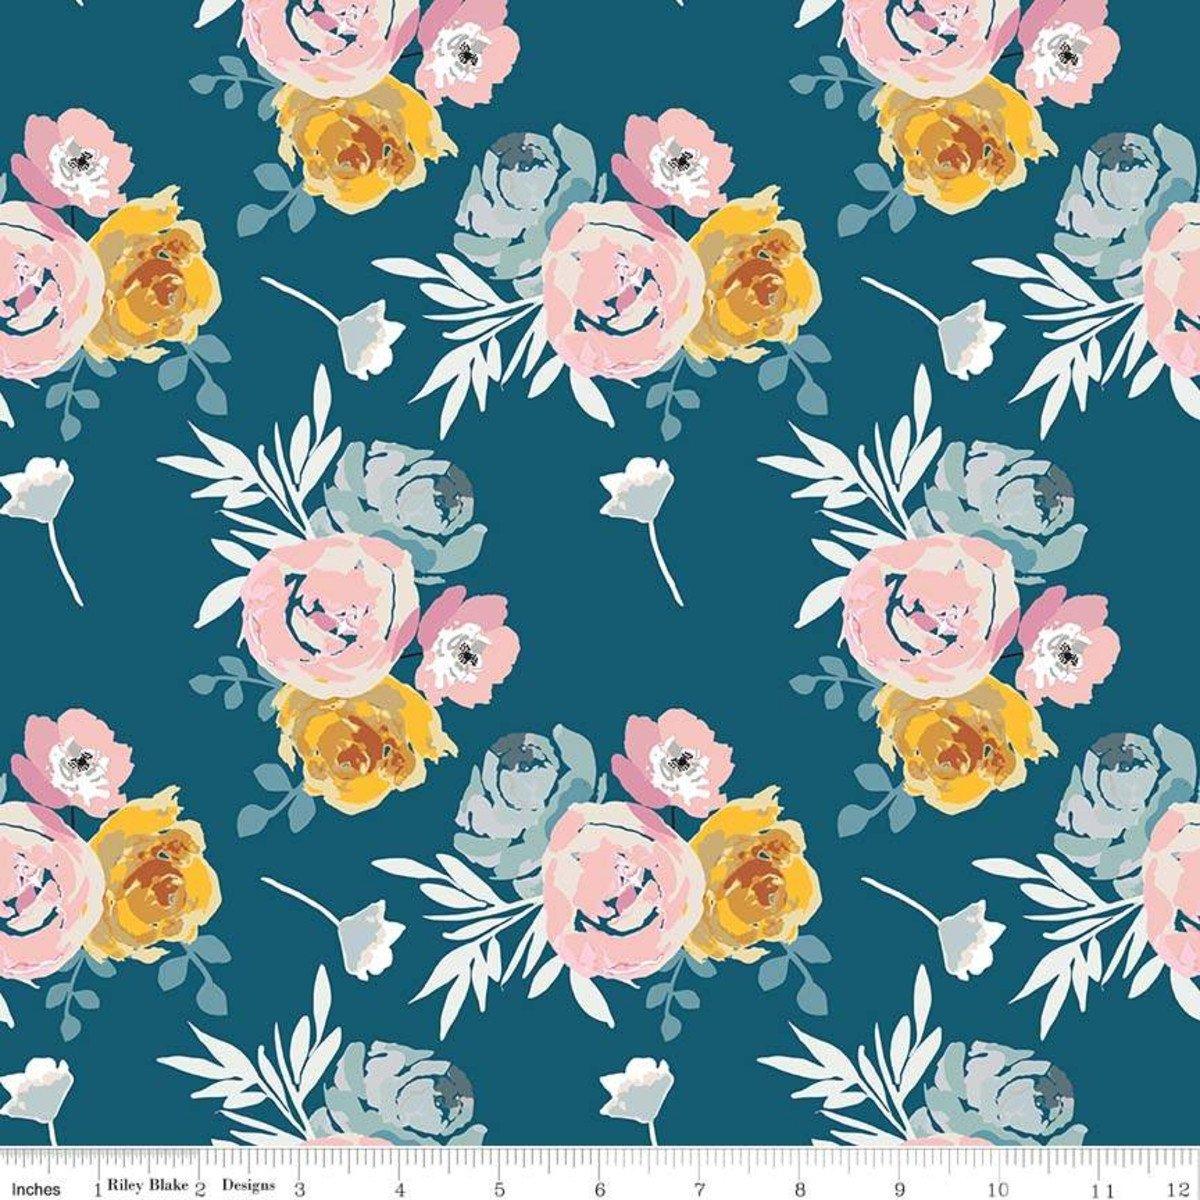 Blooms & Bobbins by Riley Blake